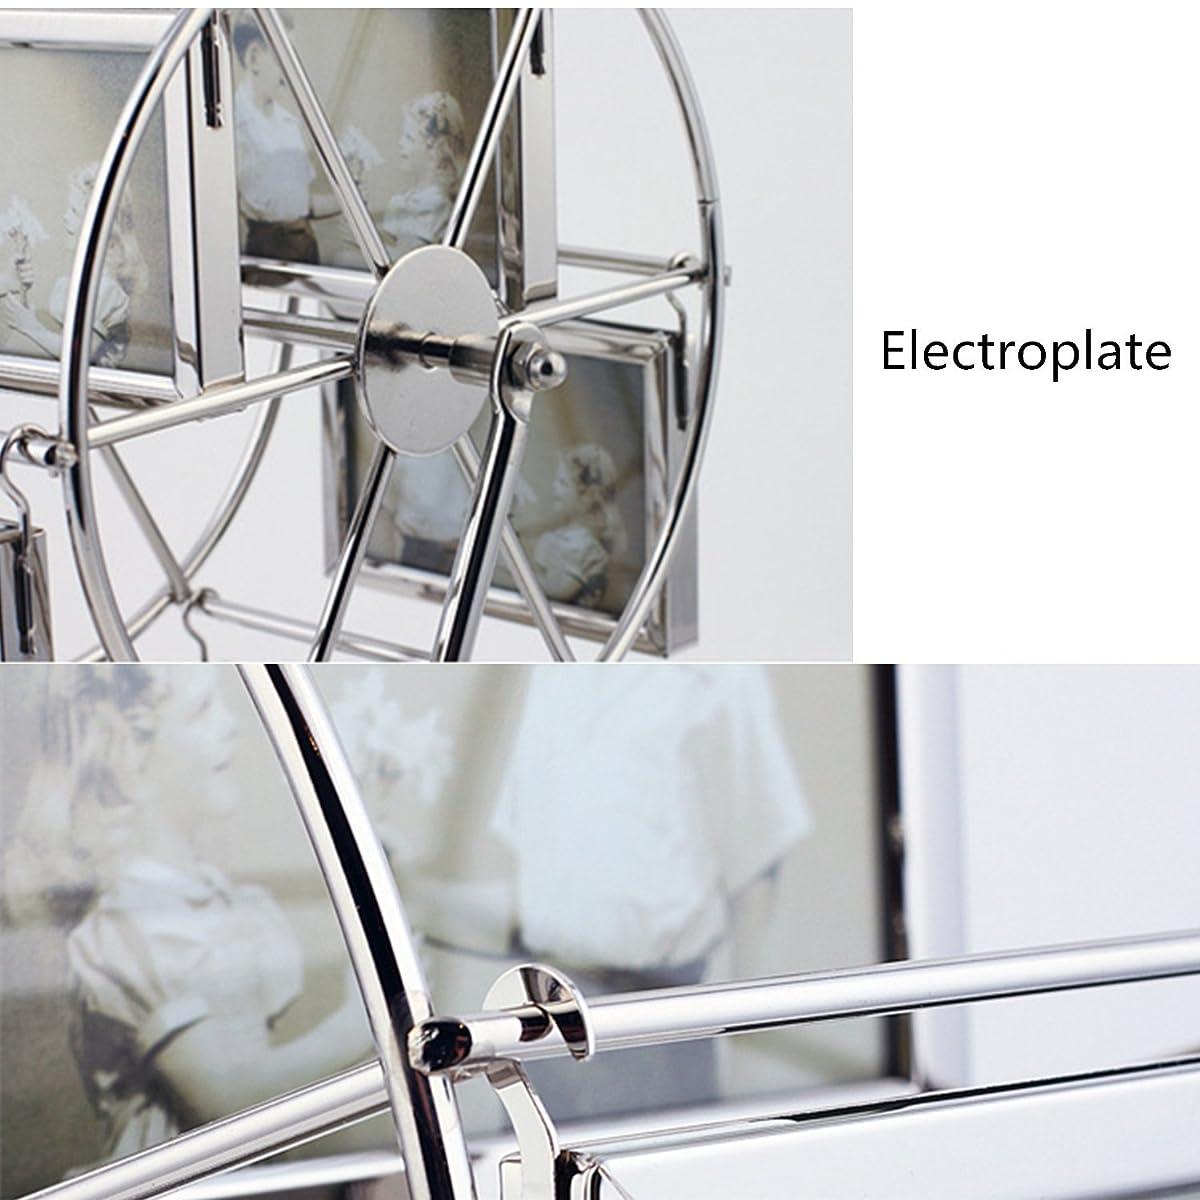 leecum Metal Ferris Wheel Photo Frame 3 inch or 5 inch Retro Style ...